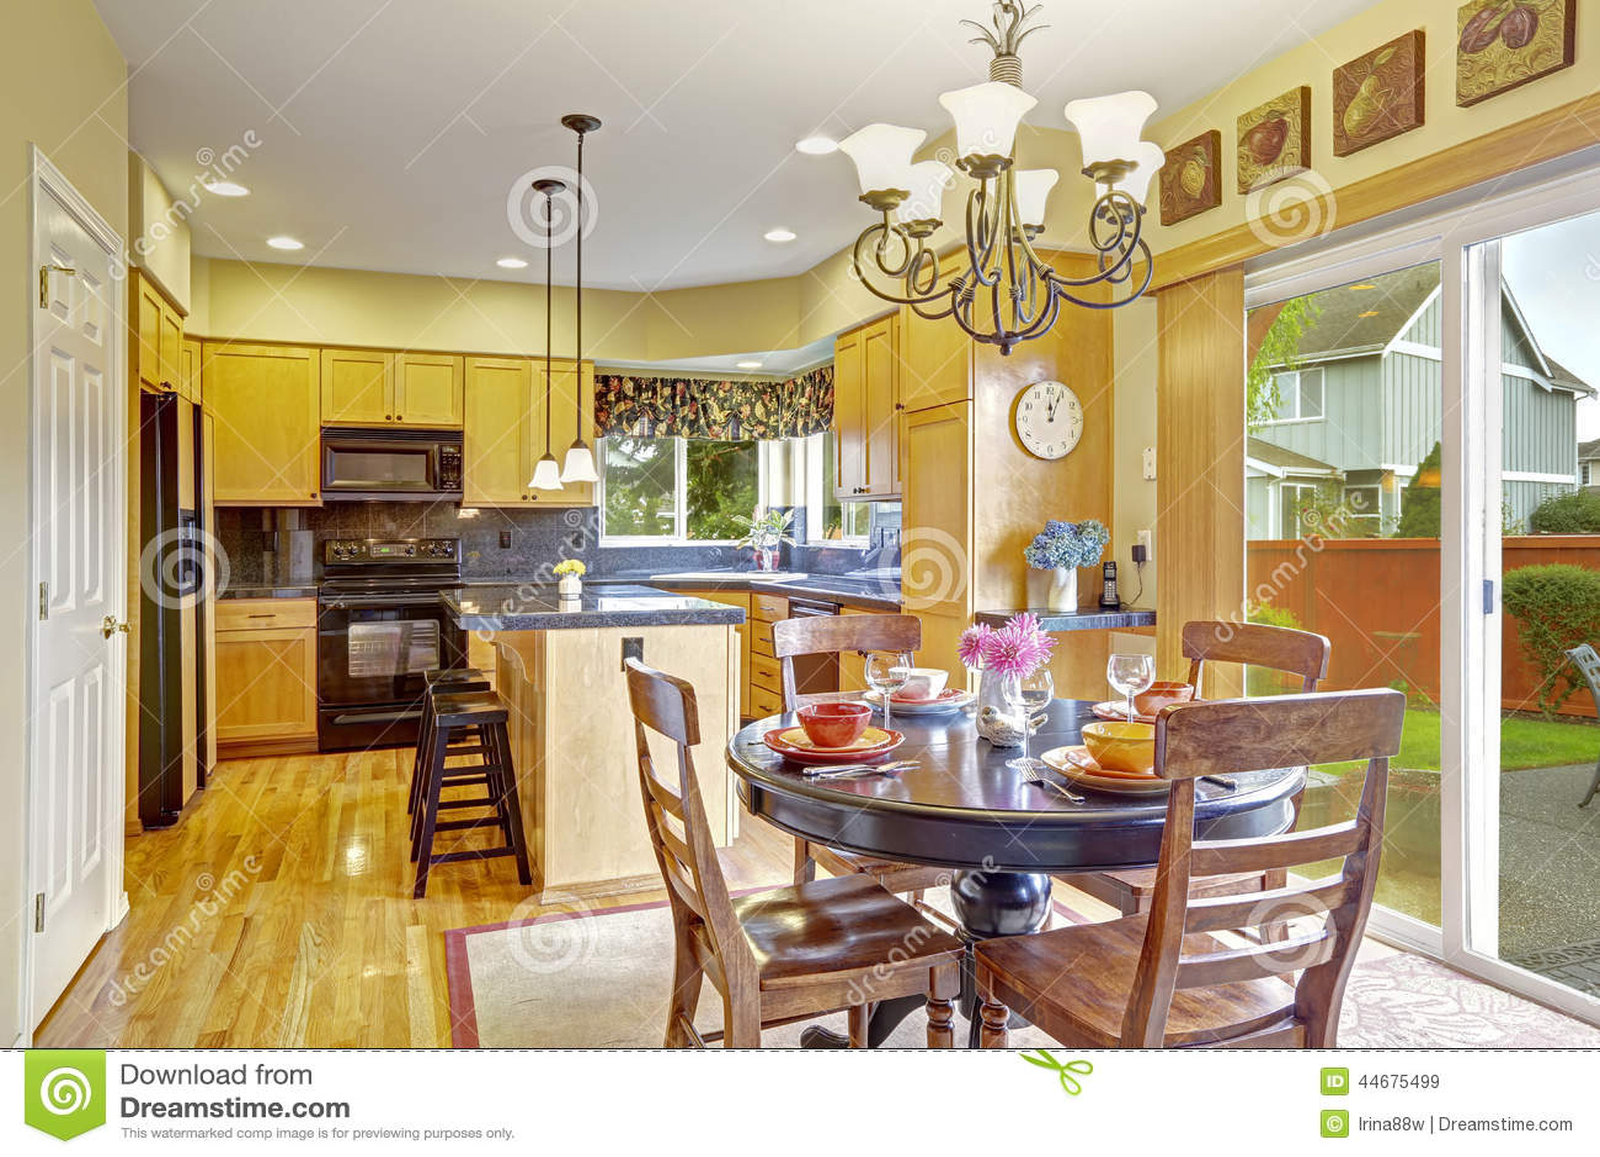 backyard kitchen designs play kitchens for boys 有饭厅和出口的厨房对后院库存图片 图片包括有图象 海岛 实际 想法 明亮的饭厅在有出口的厨房屋子里对后院露台